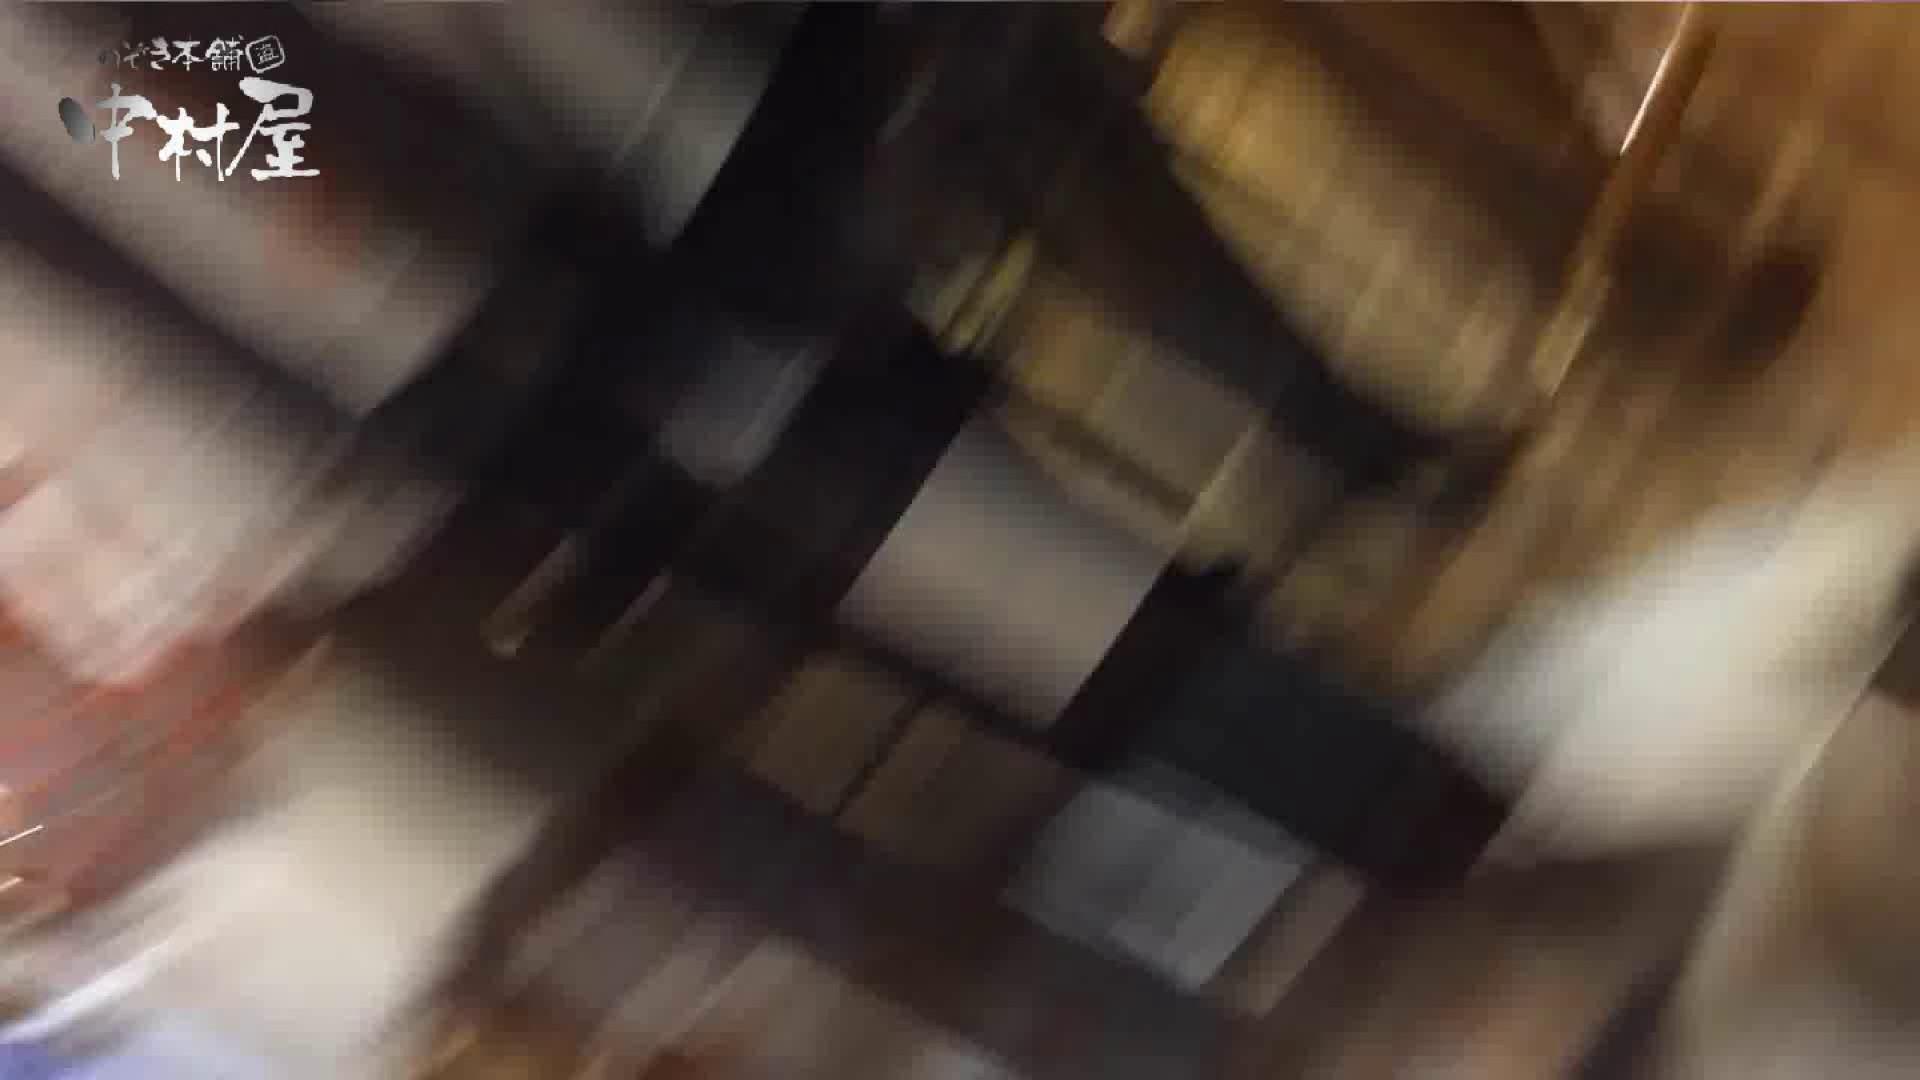 vol.43 可愛いカリスマ店員限定‼胸チラ&パンチラ 美脚おねーさんの胸元ゲット! 接写 | 胸チラ  76PIX 53